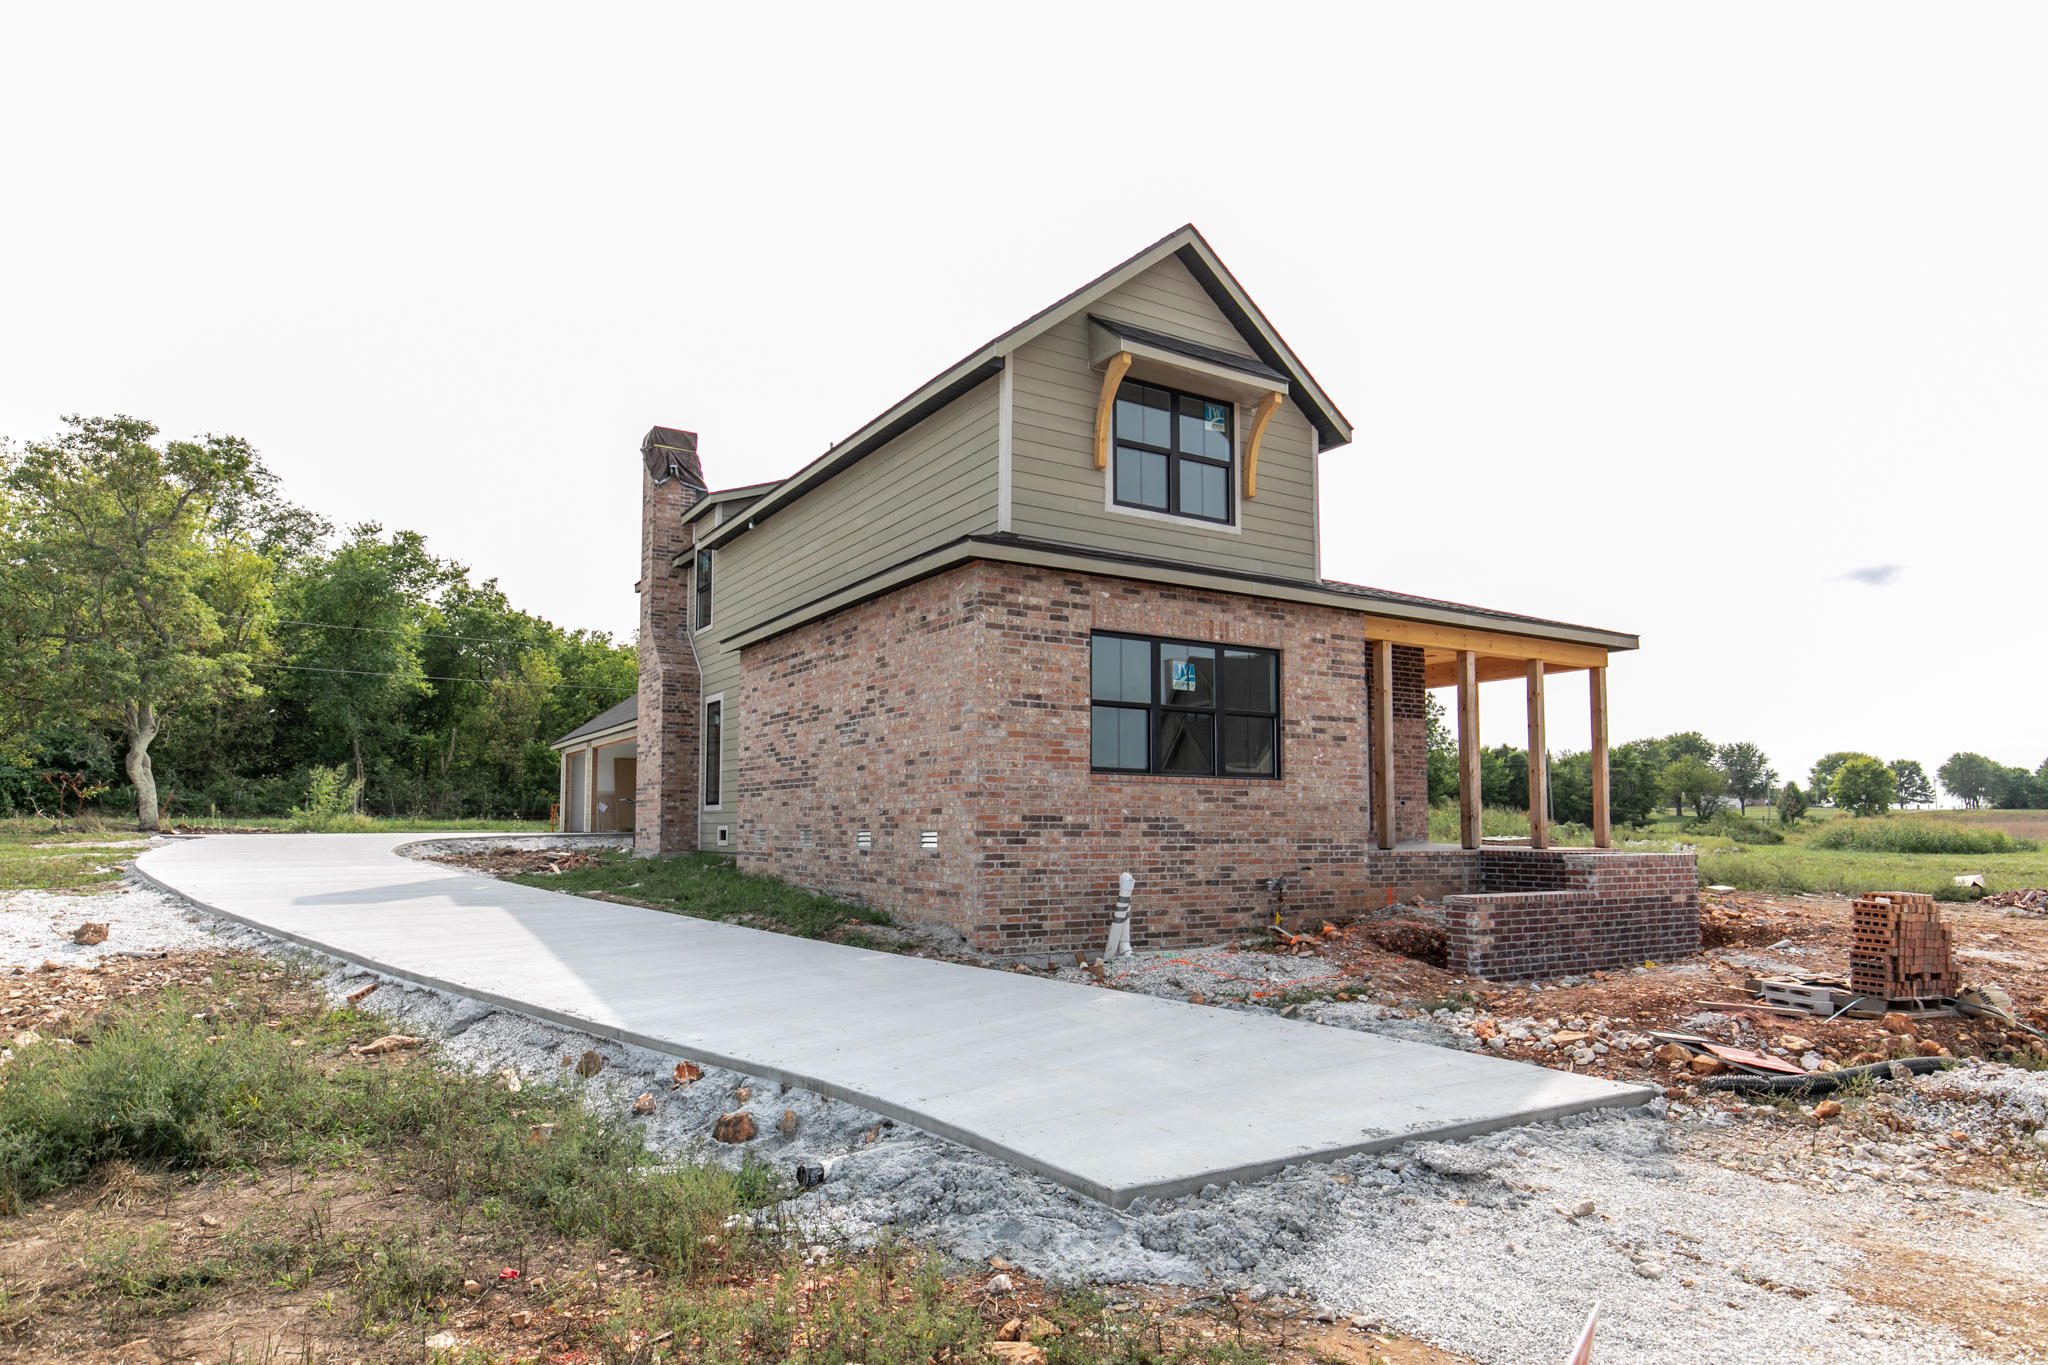 1355 South Wilder Trail Republic, MO 65738